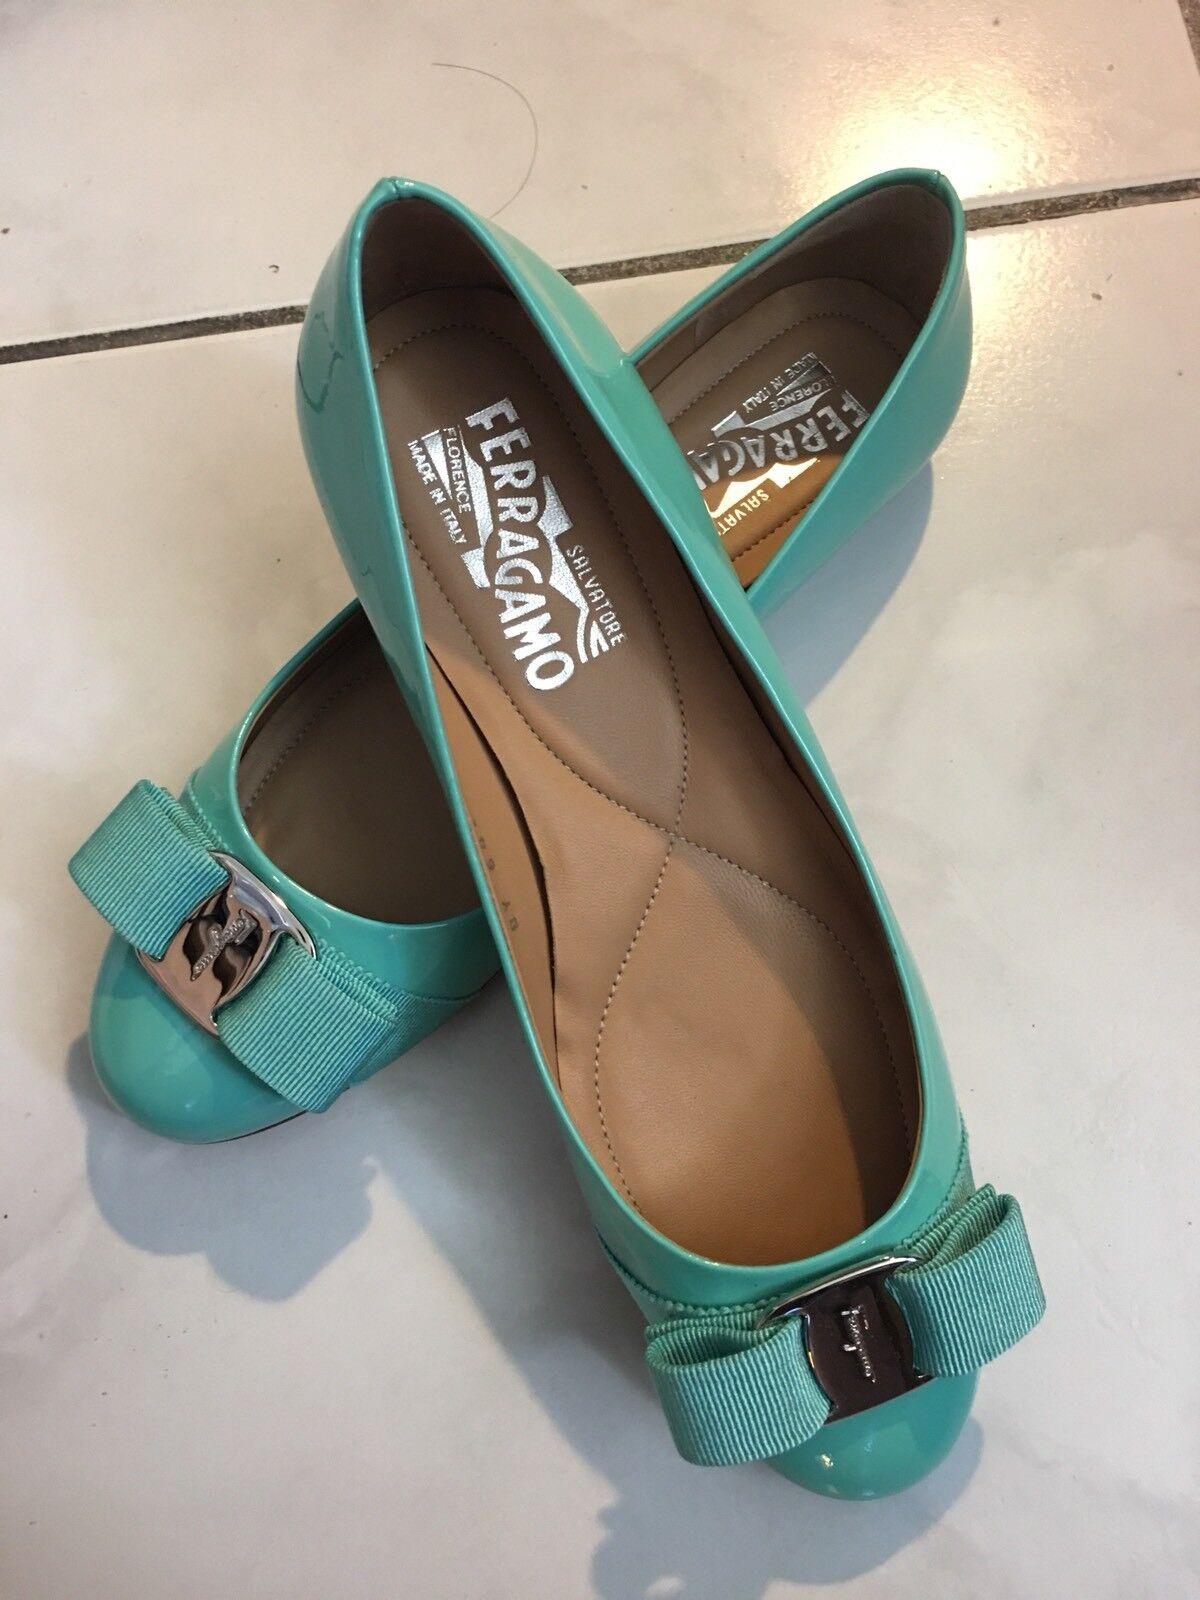 SALVATORE FERRAGAMO Women's classic varina ballet turquoise patent flat ITALY6.5